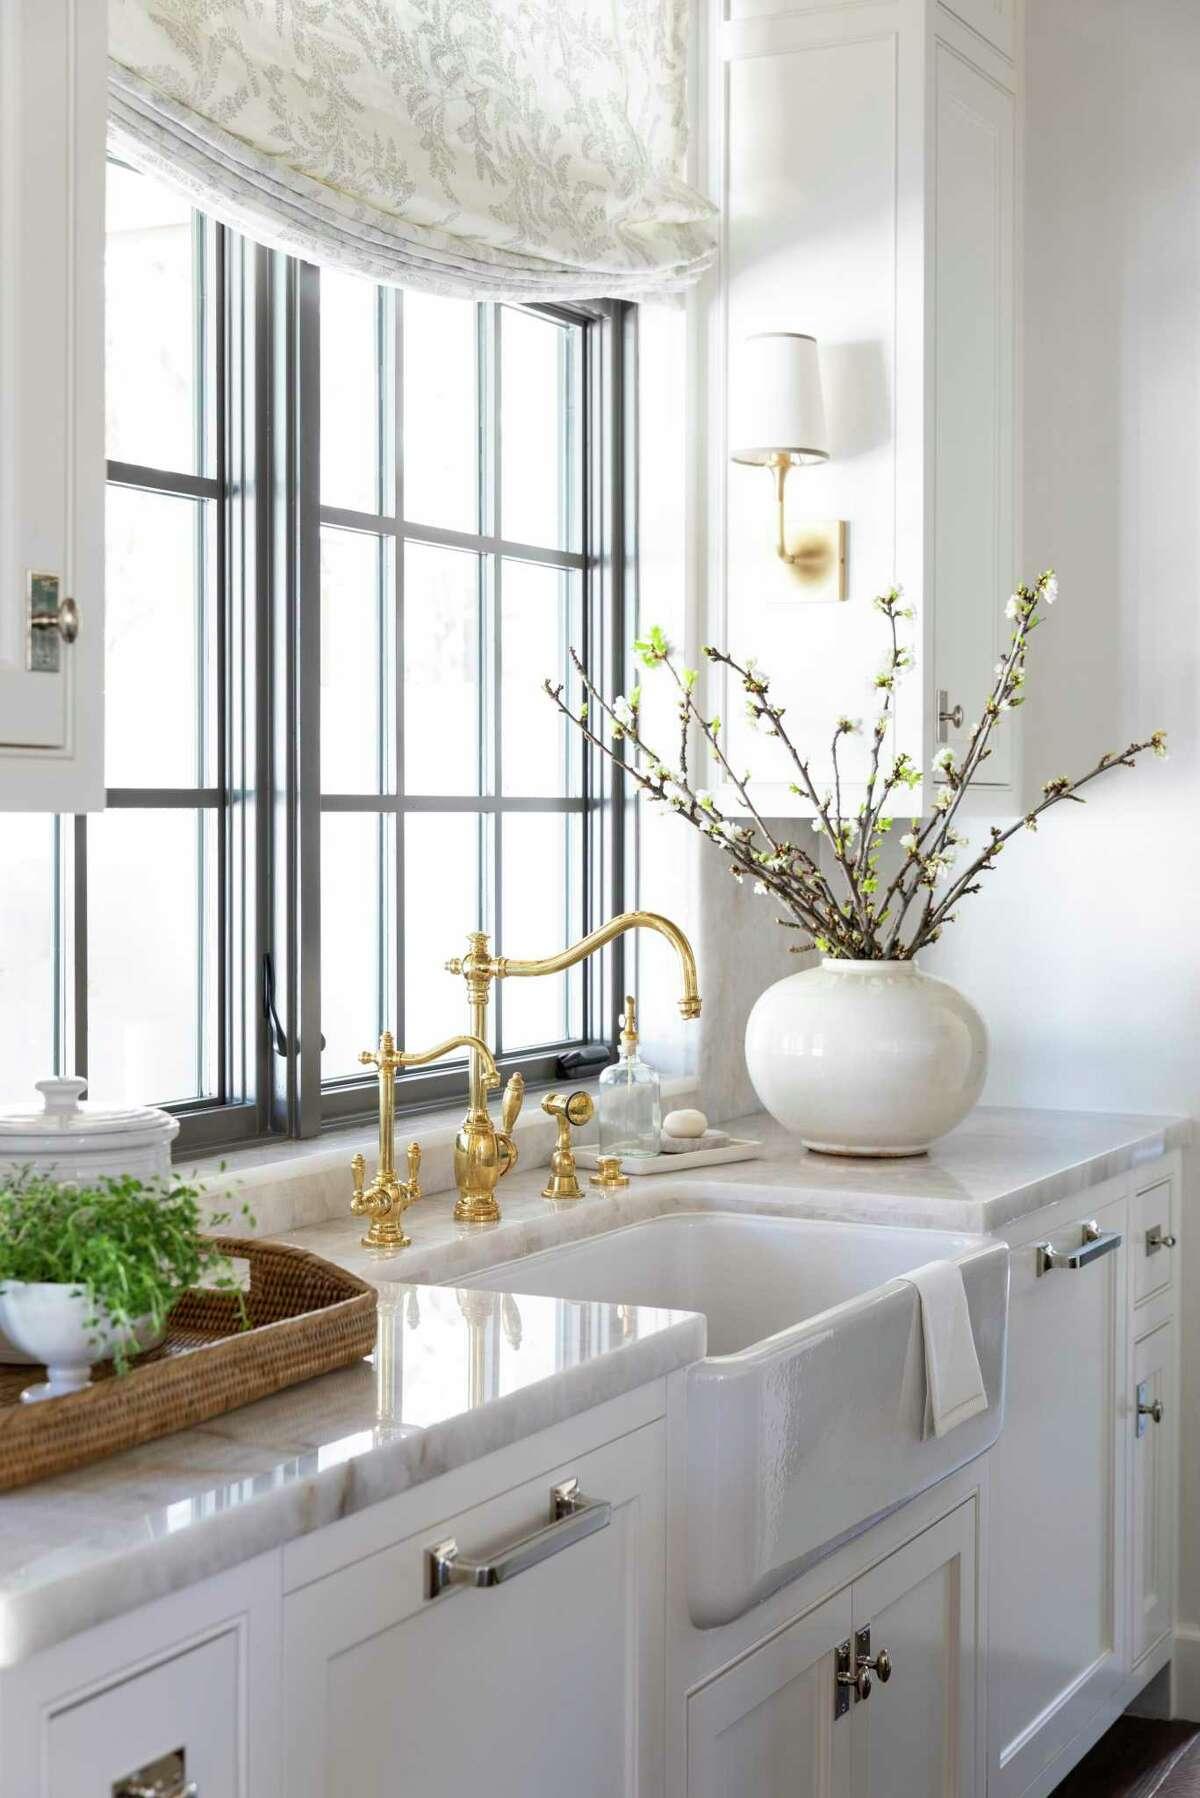 Quartzite counters were chosen for durability in the kitchen.